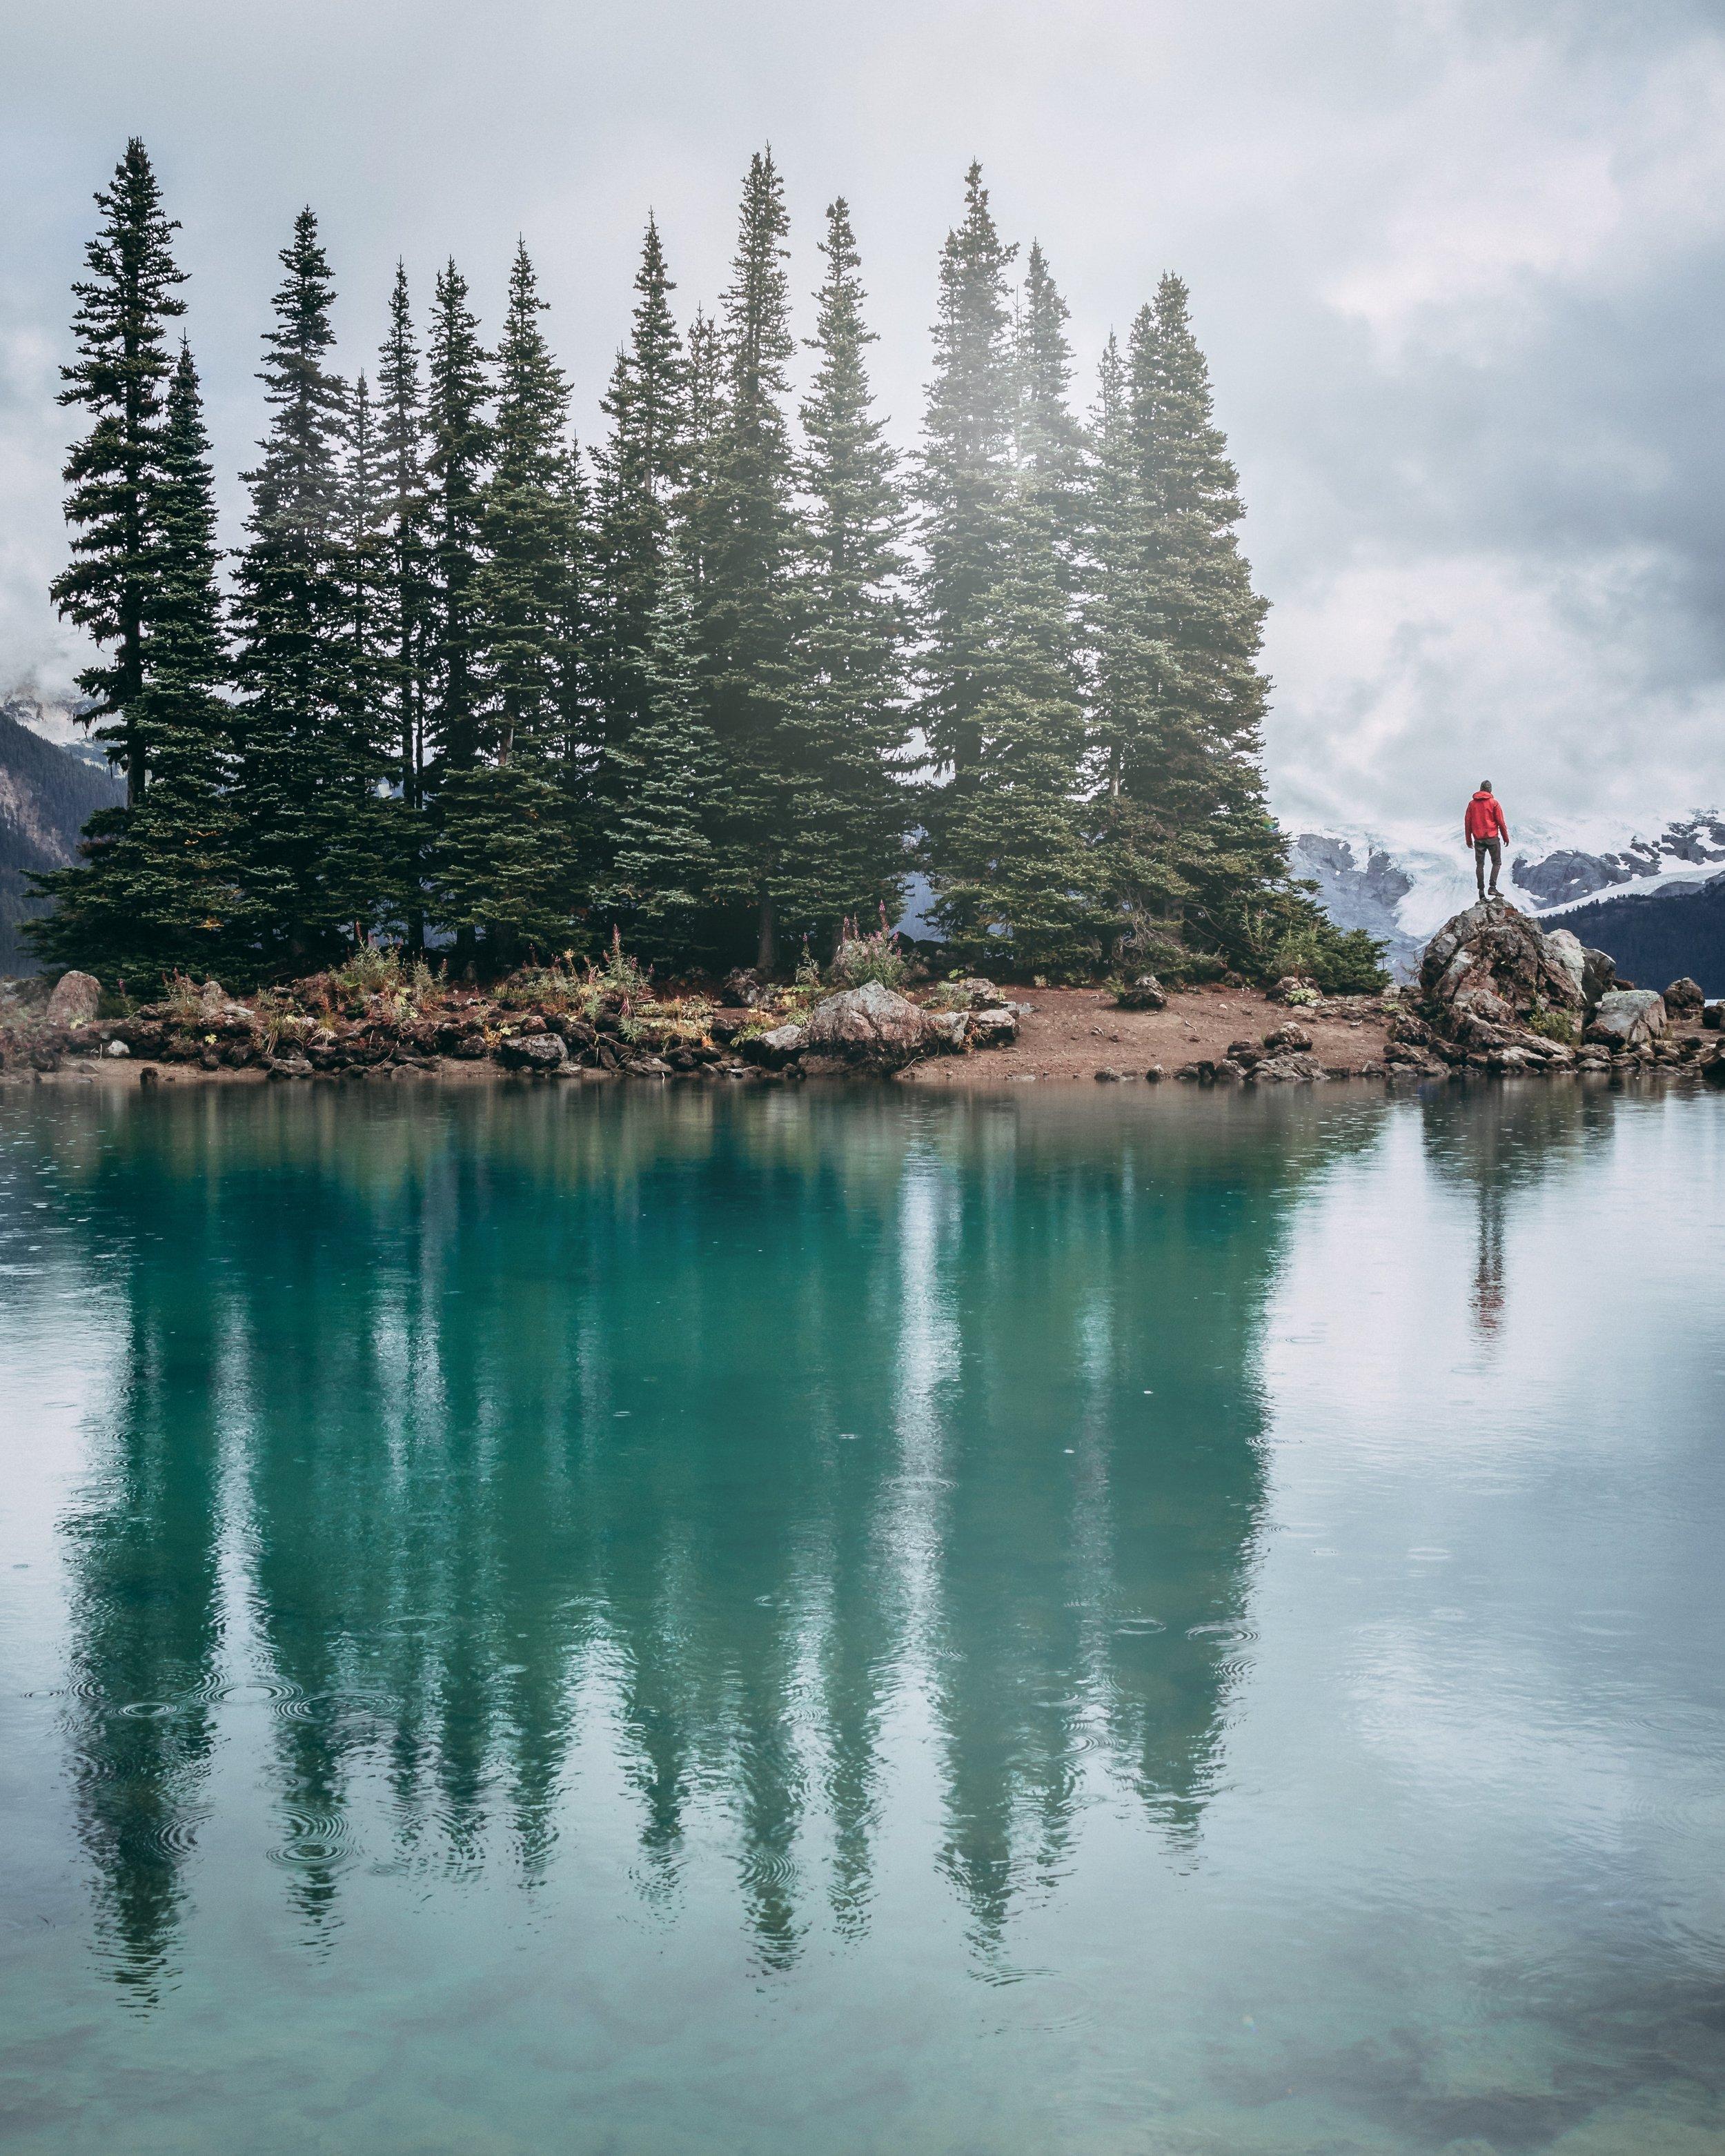 Photo Credit: Kristine Krynitzki, Hikes Near Vancouver